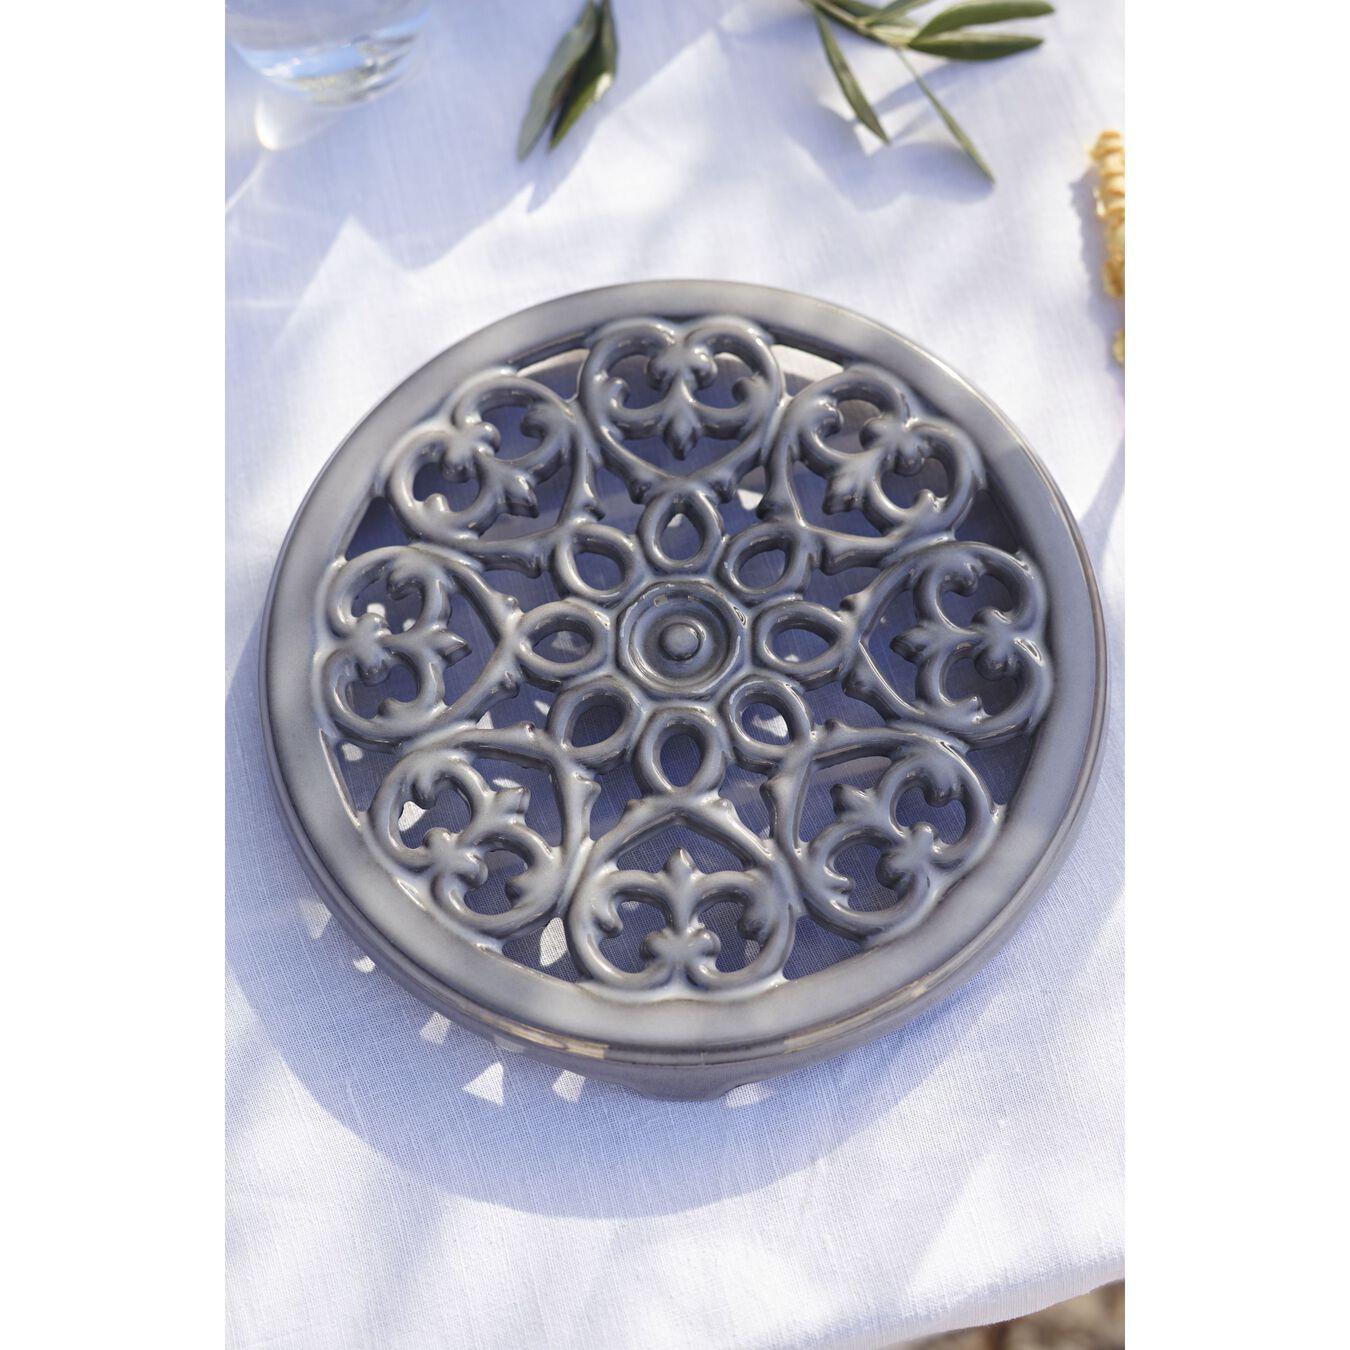 23 cm round cast iron Trivet, lily decal, graphite-grey,,large 2